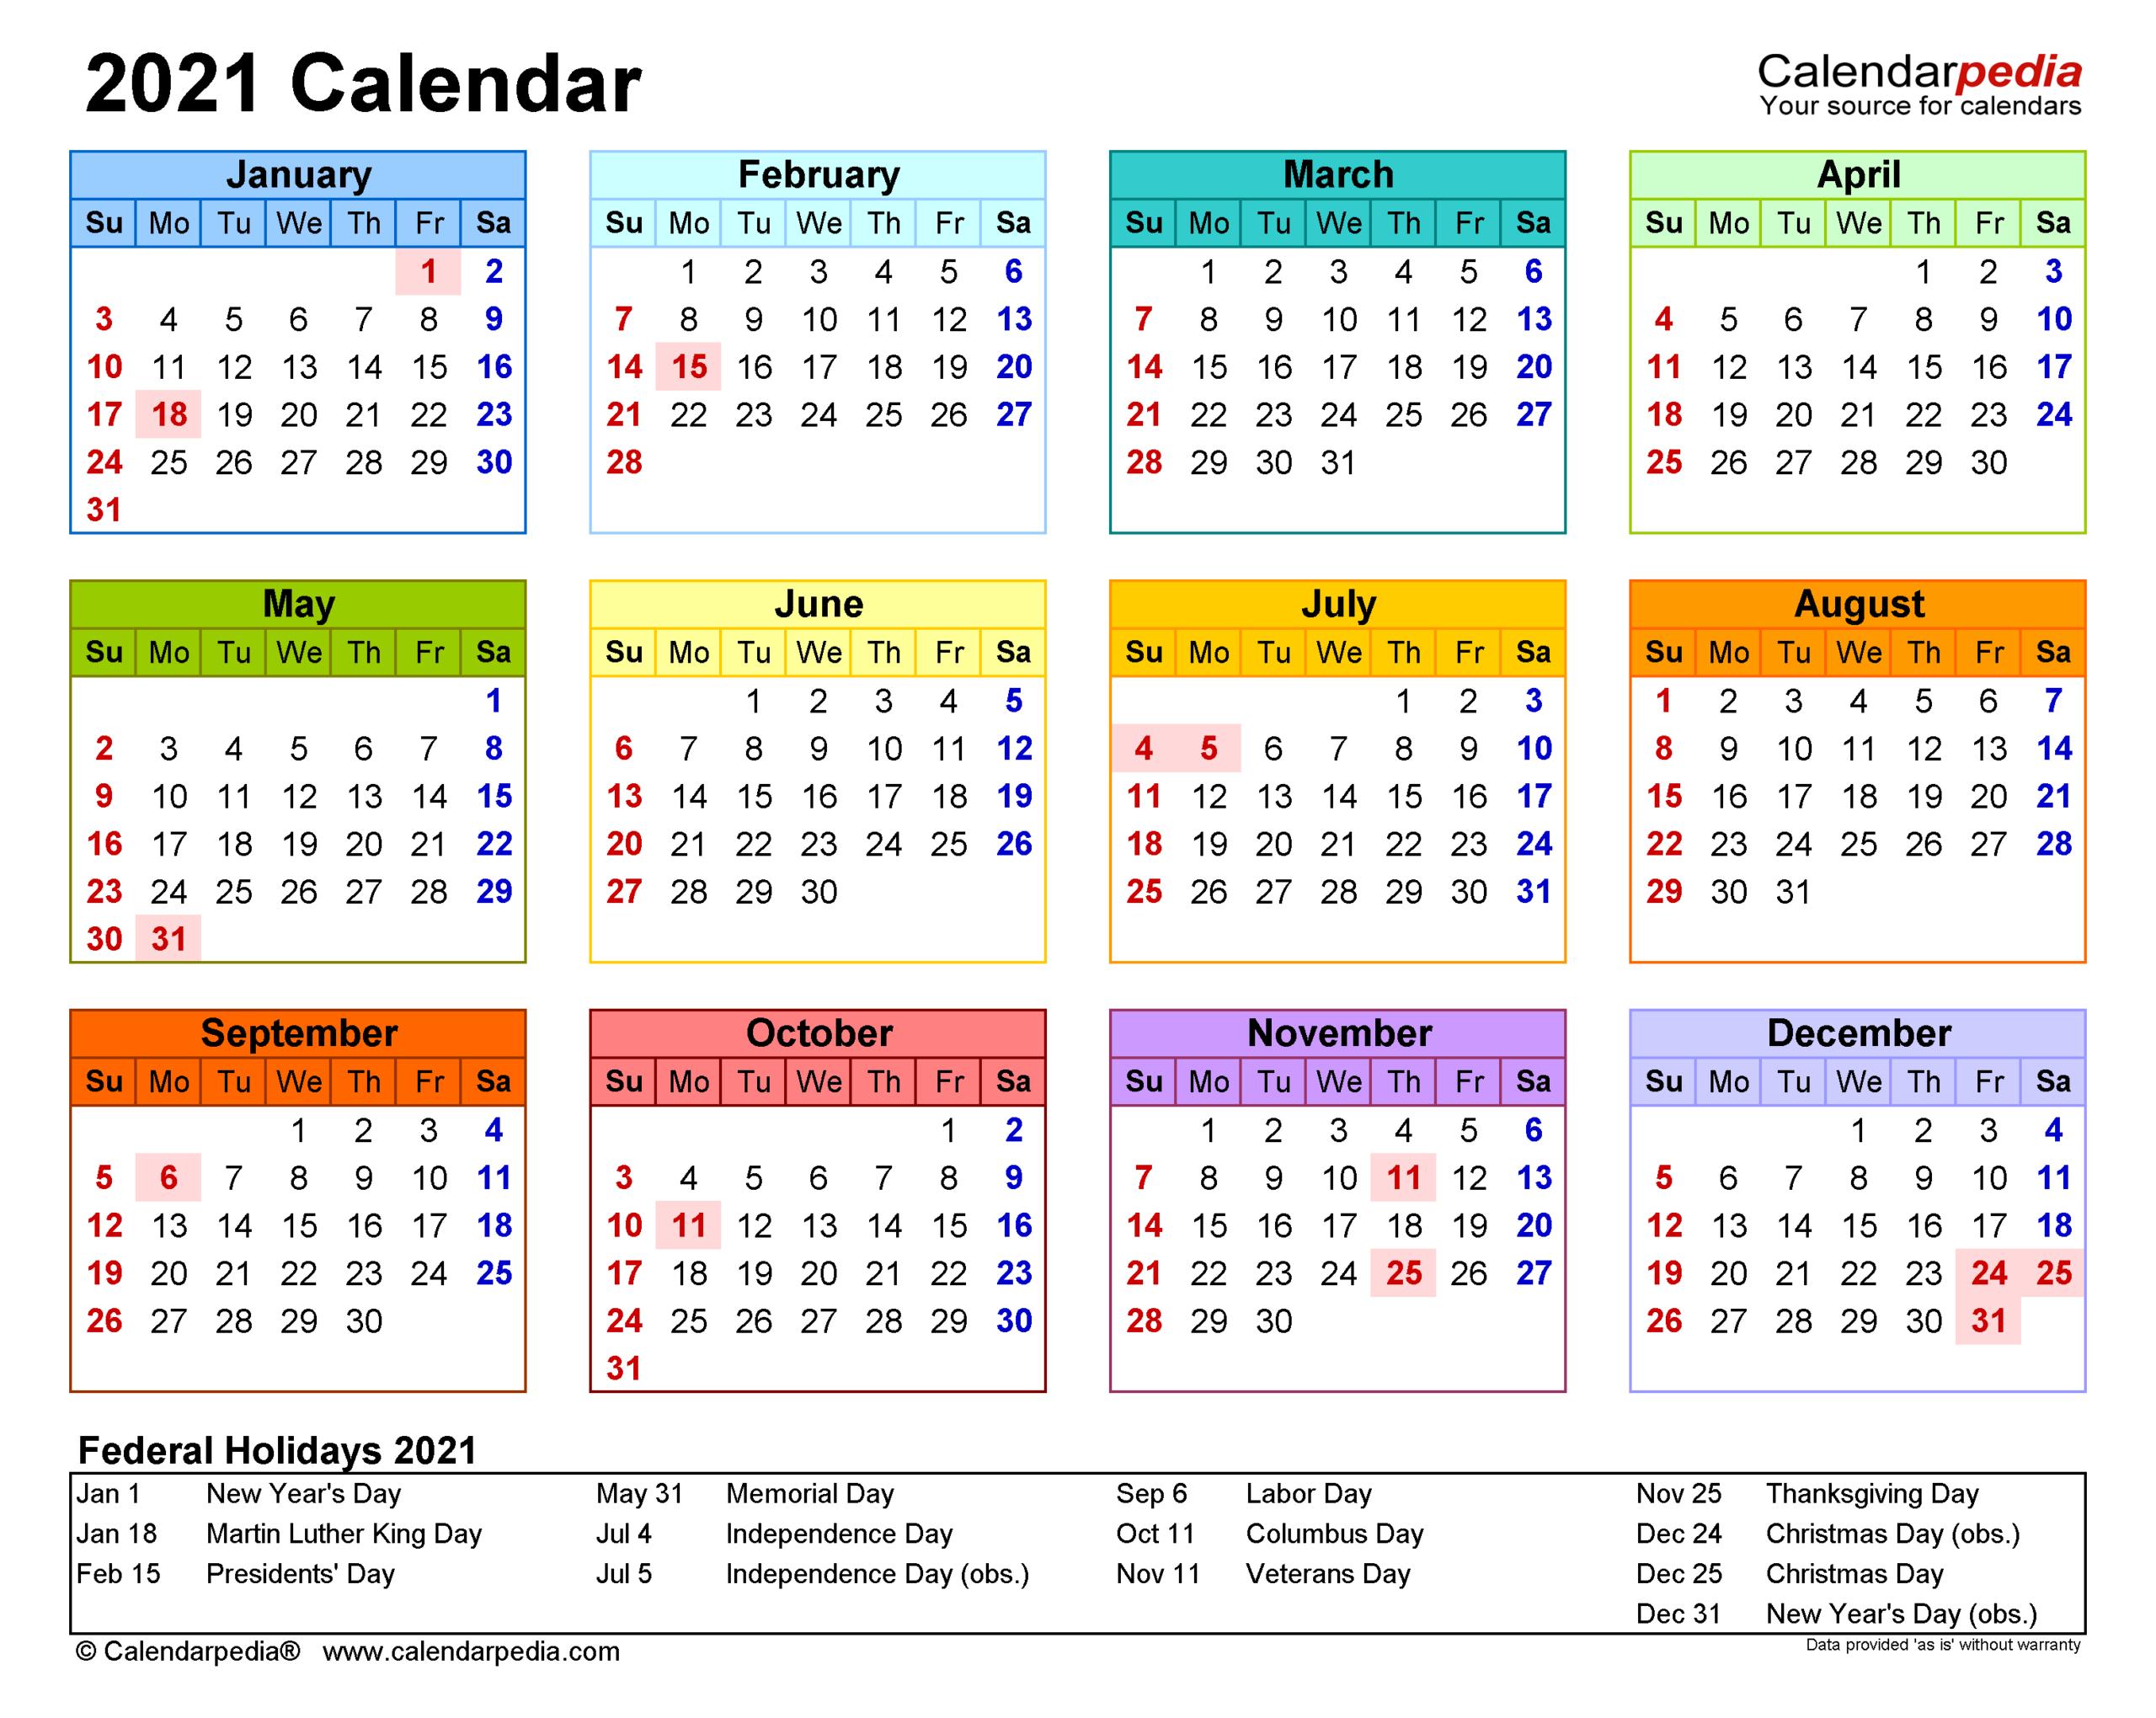 2021 Calendar - Free Printable Excel Templates - Calendarpedia within 2021 Printable Pocket Calendars